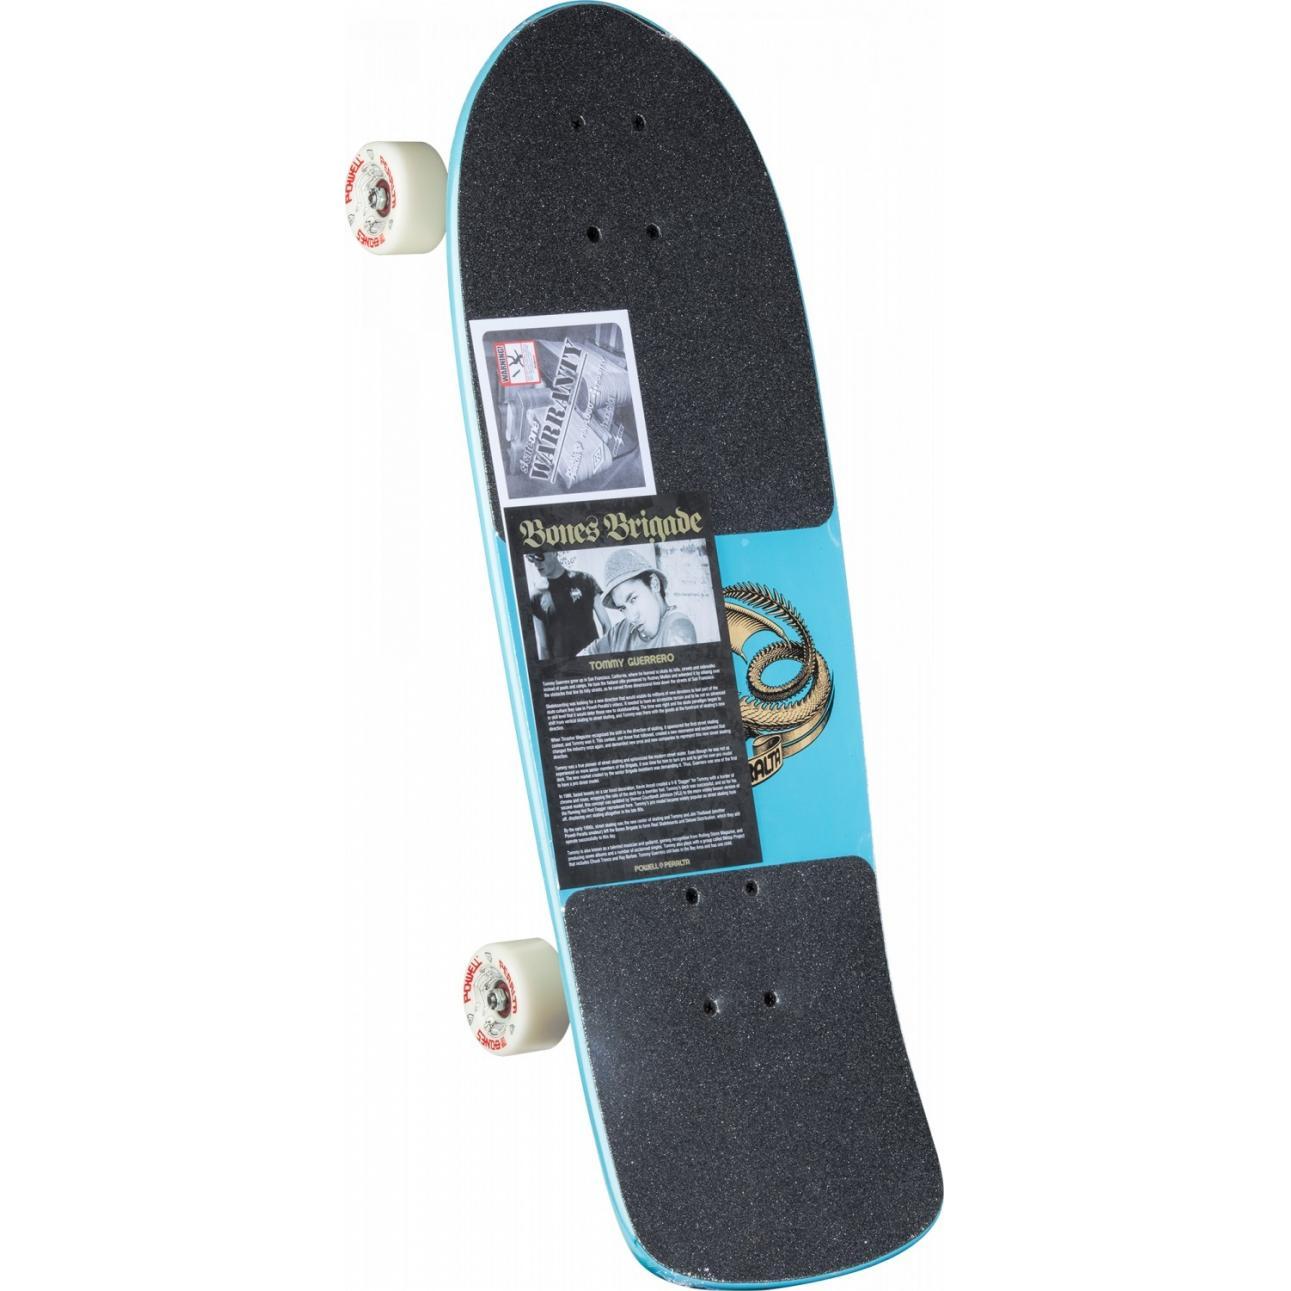 Bones Brigade Tommy Guerrero Complete Skateboard Blue - 9.6 x 29.18